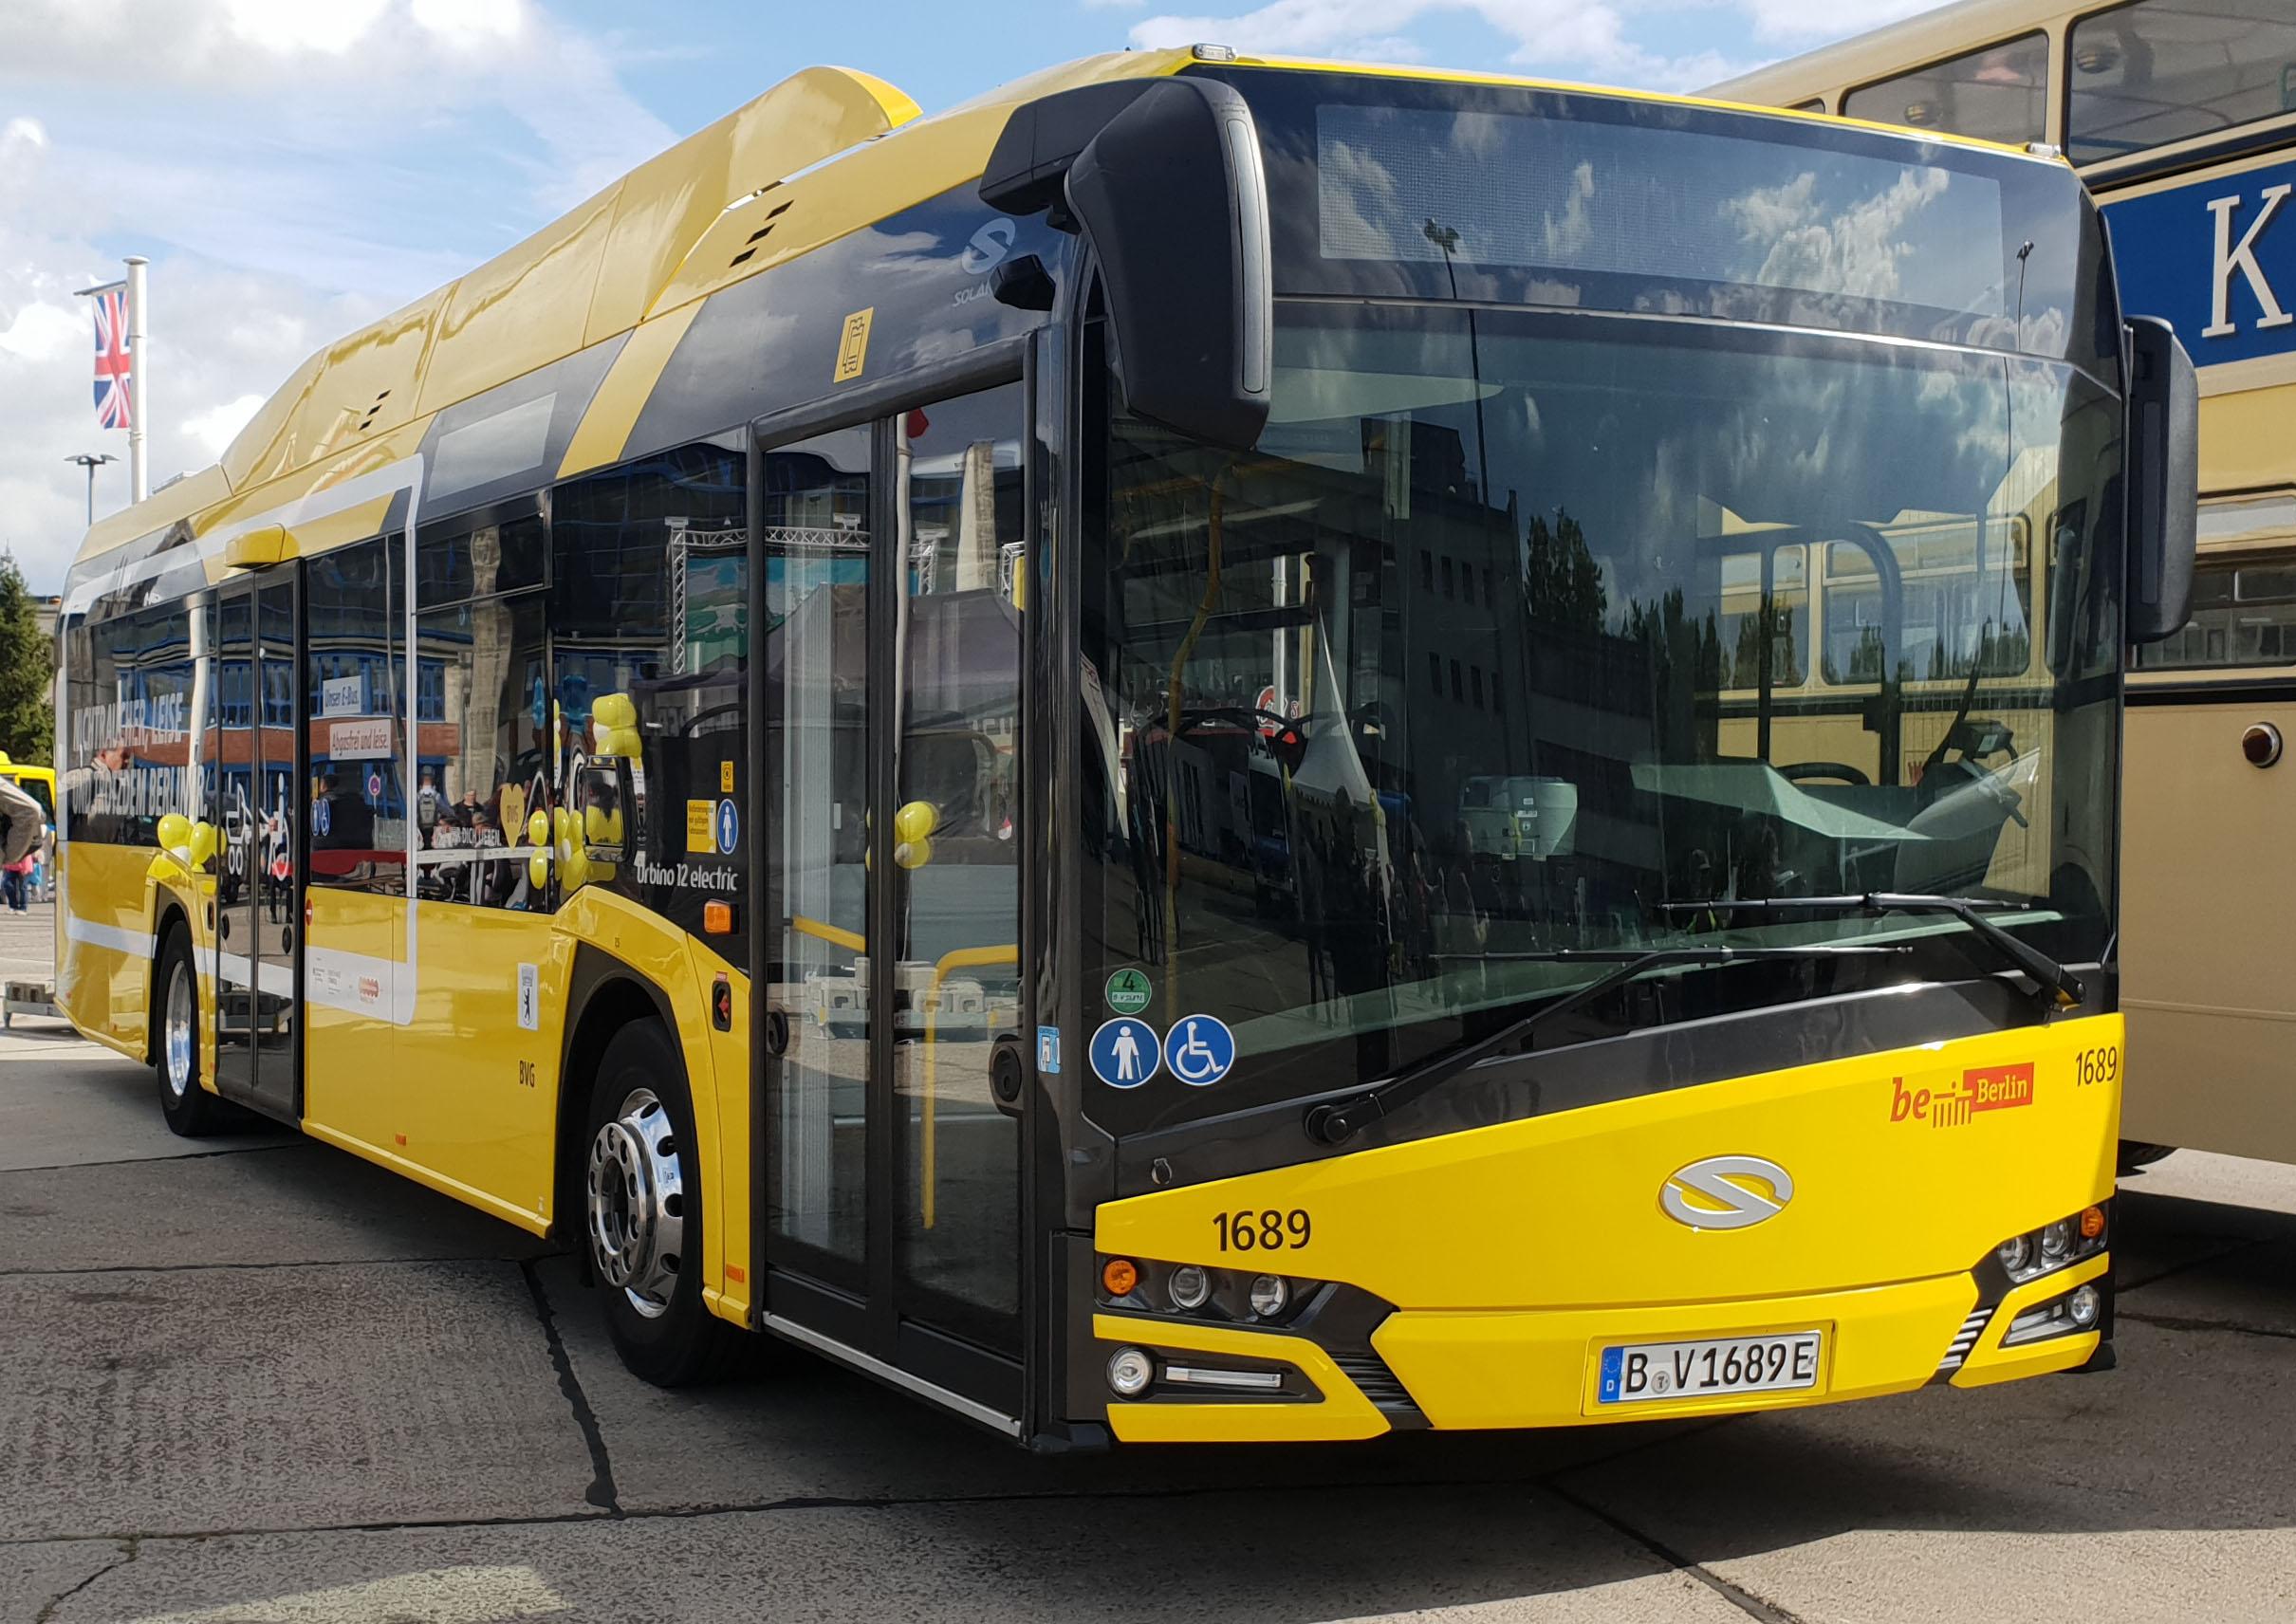 Foto: Bus 1689, Typ Solaris Urbino 12 Electric, Hof Siegfriedstr., September 2018